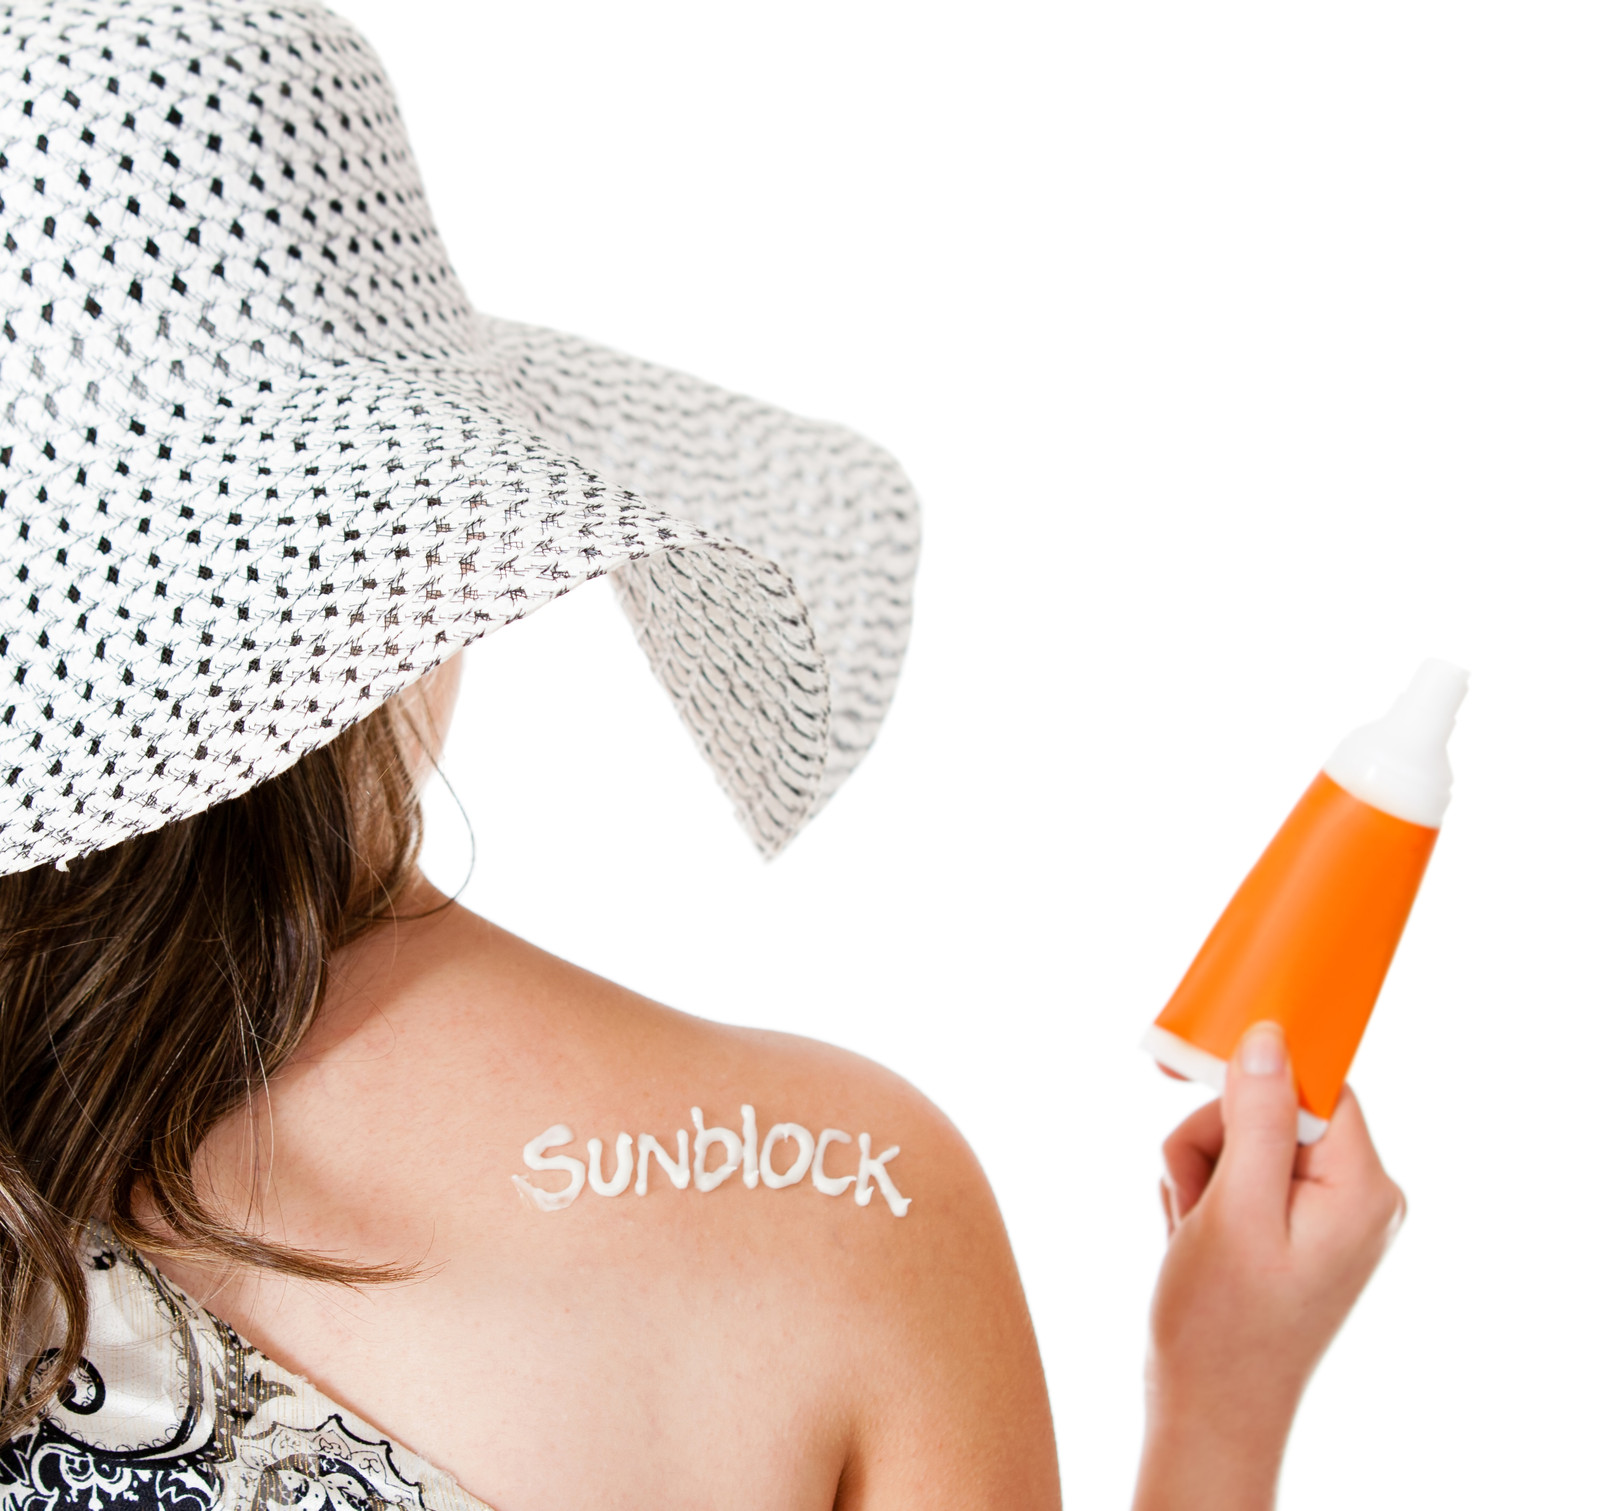 sunblock tanning product